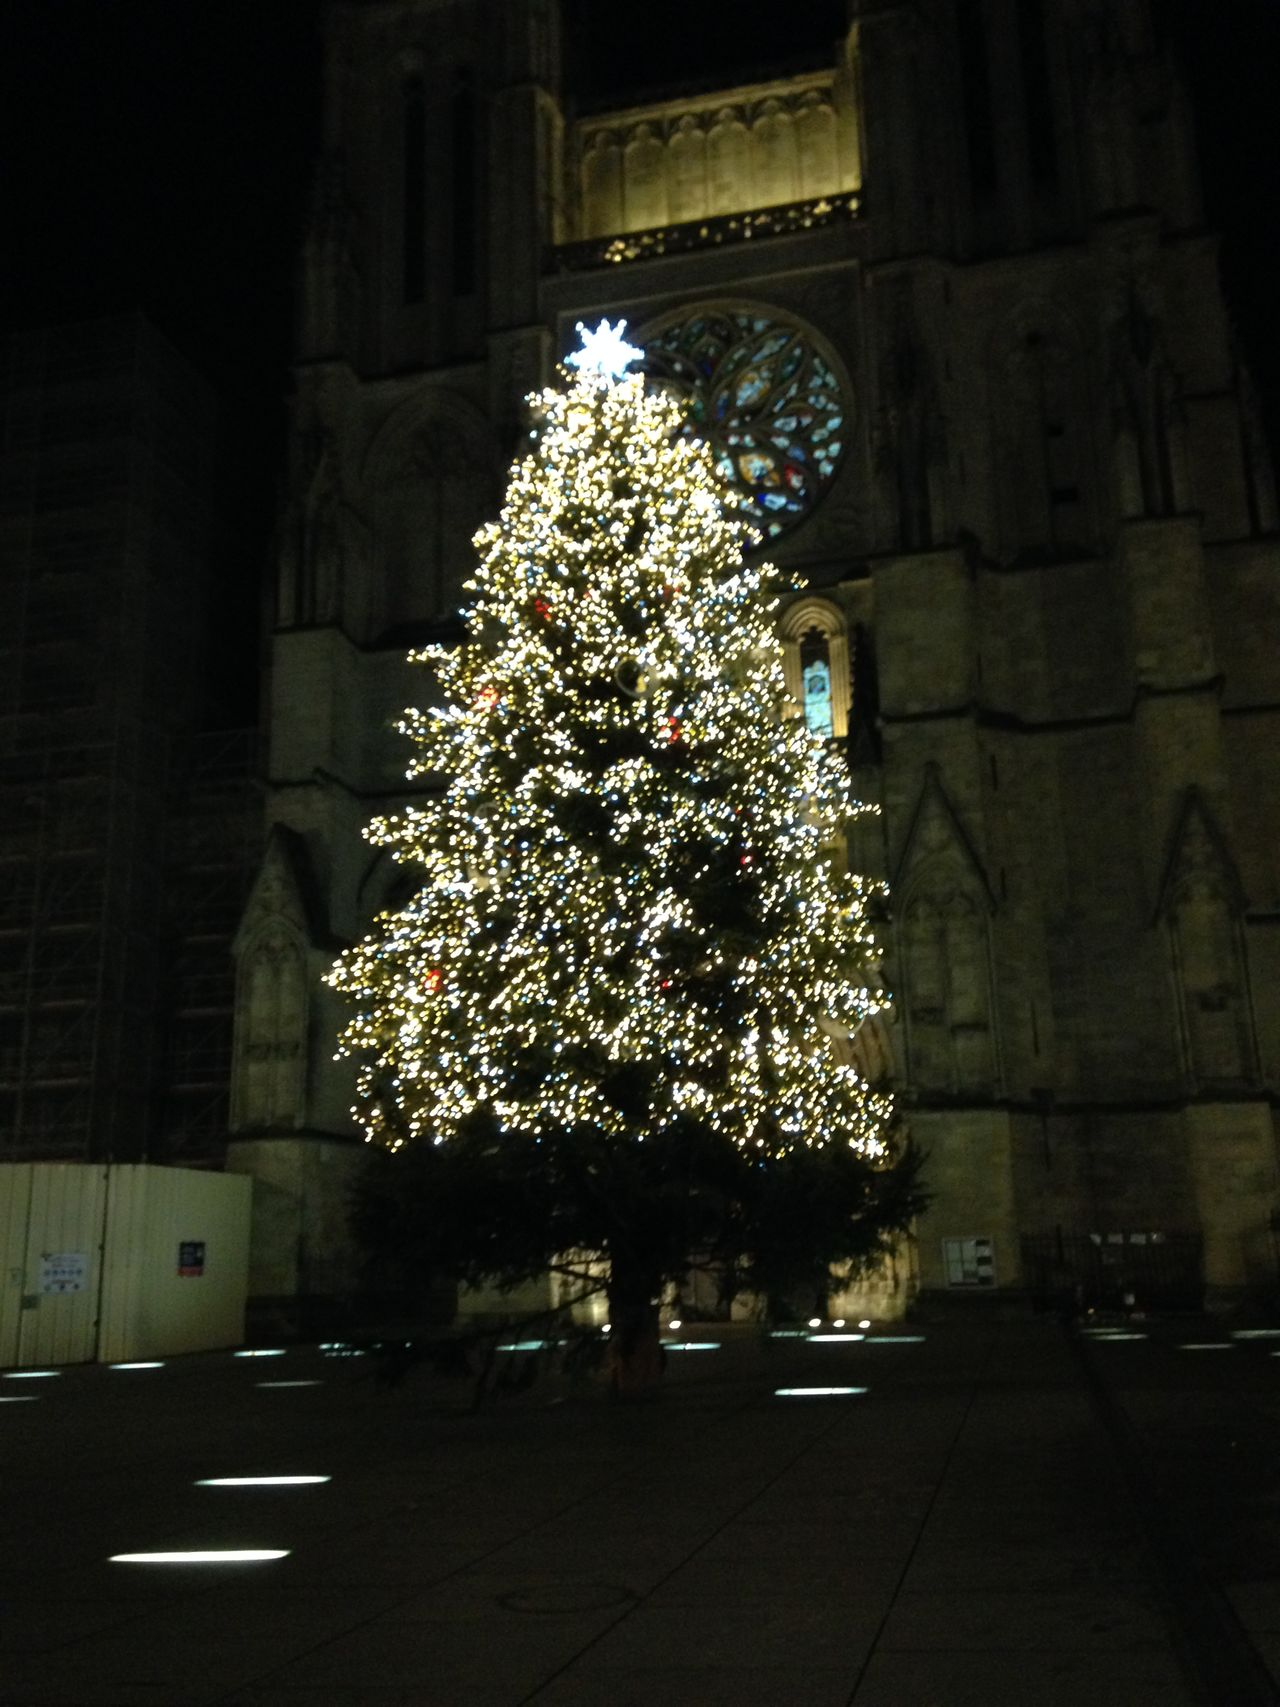 Arbre De Noël Sapin De Noël Noël Joyeux Noël Bordeaux Hôtel De Ville Hôtel De Ville Bordeaux